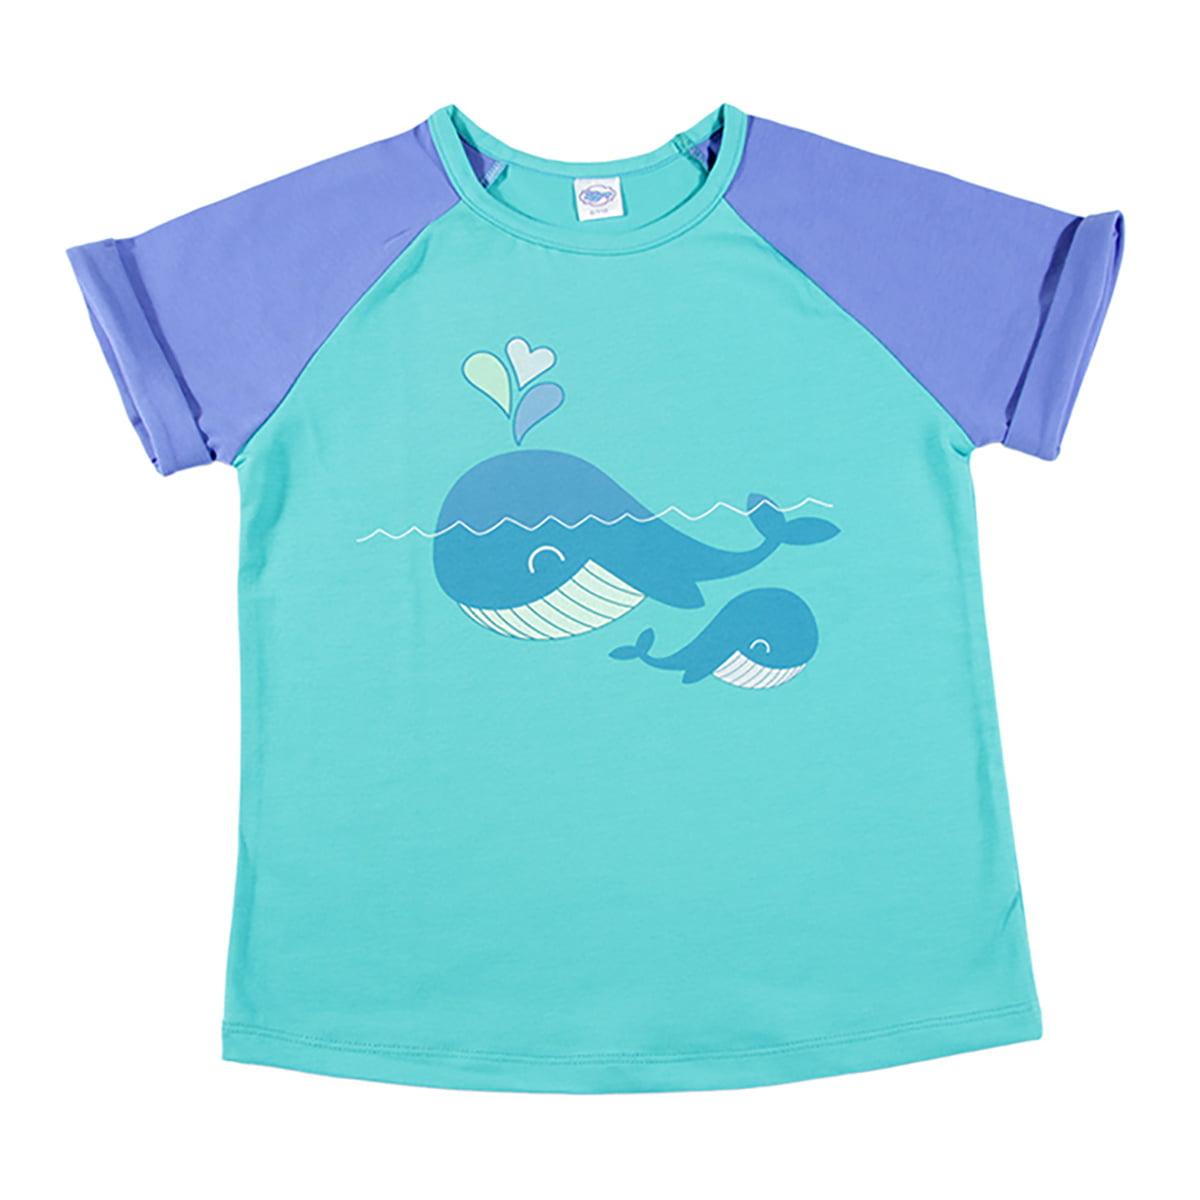 Veliko plavetnilo majica za djecu